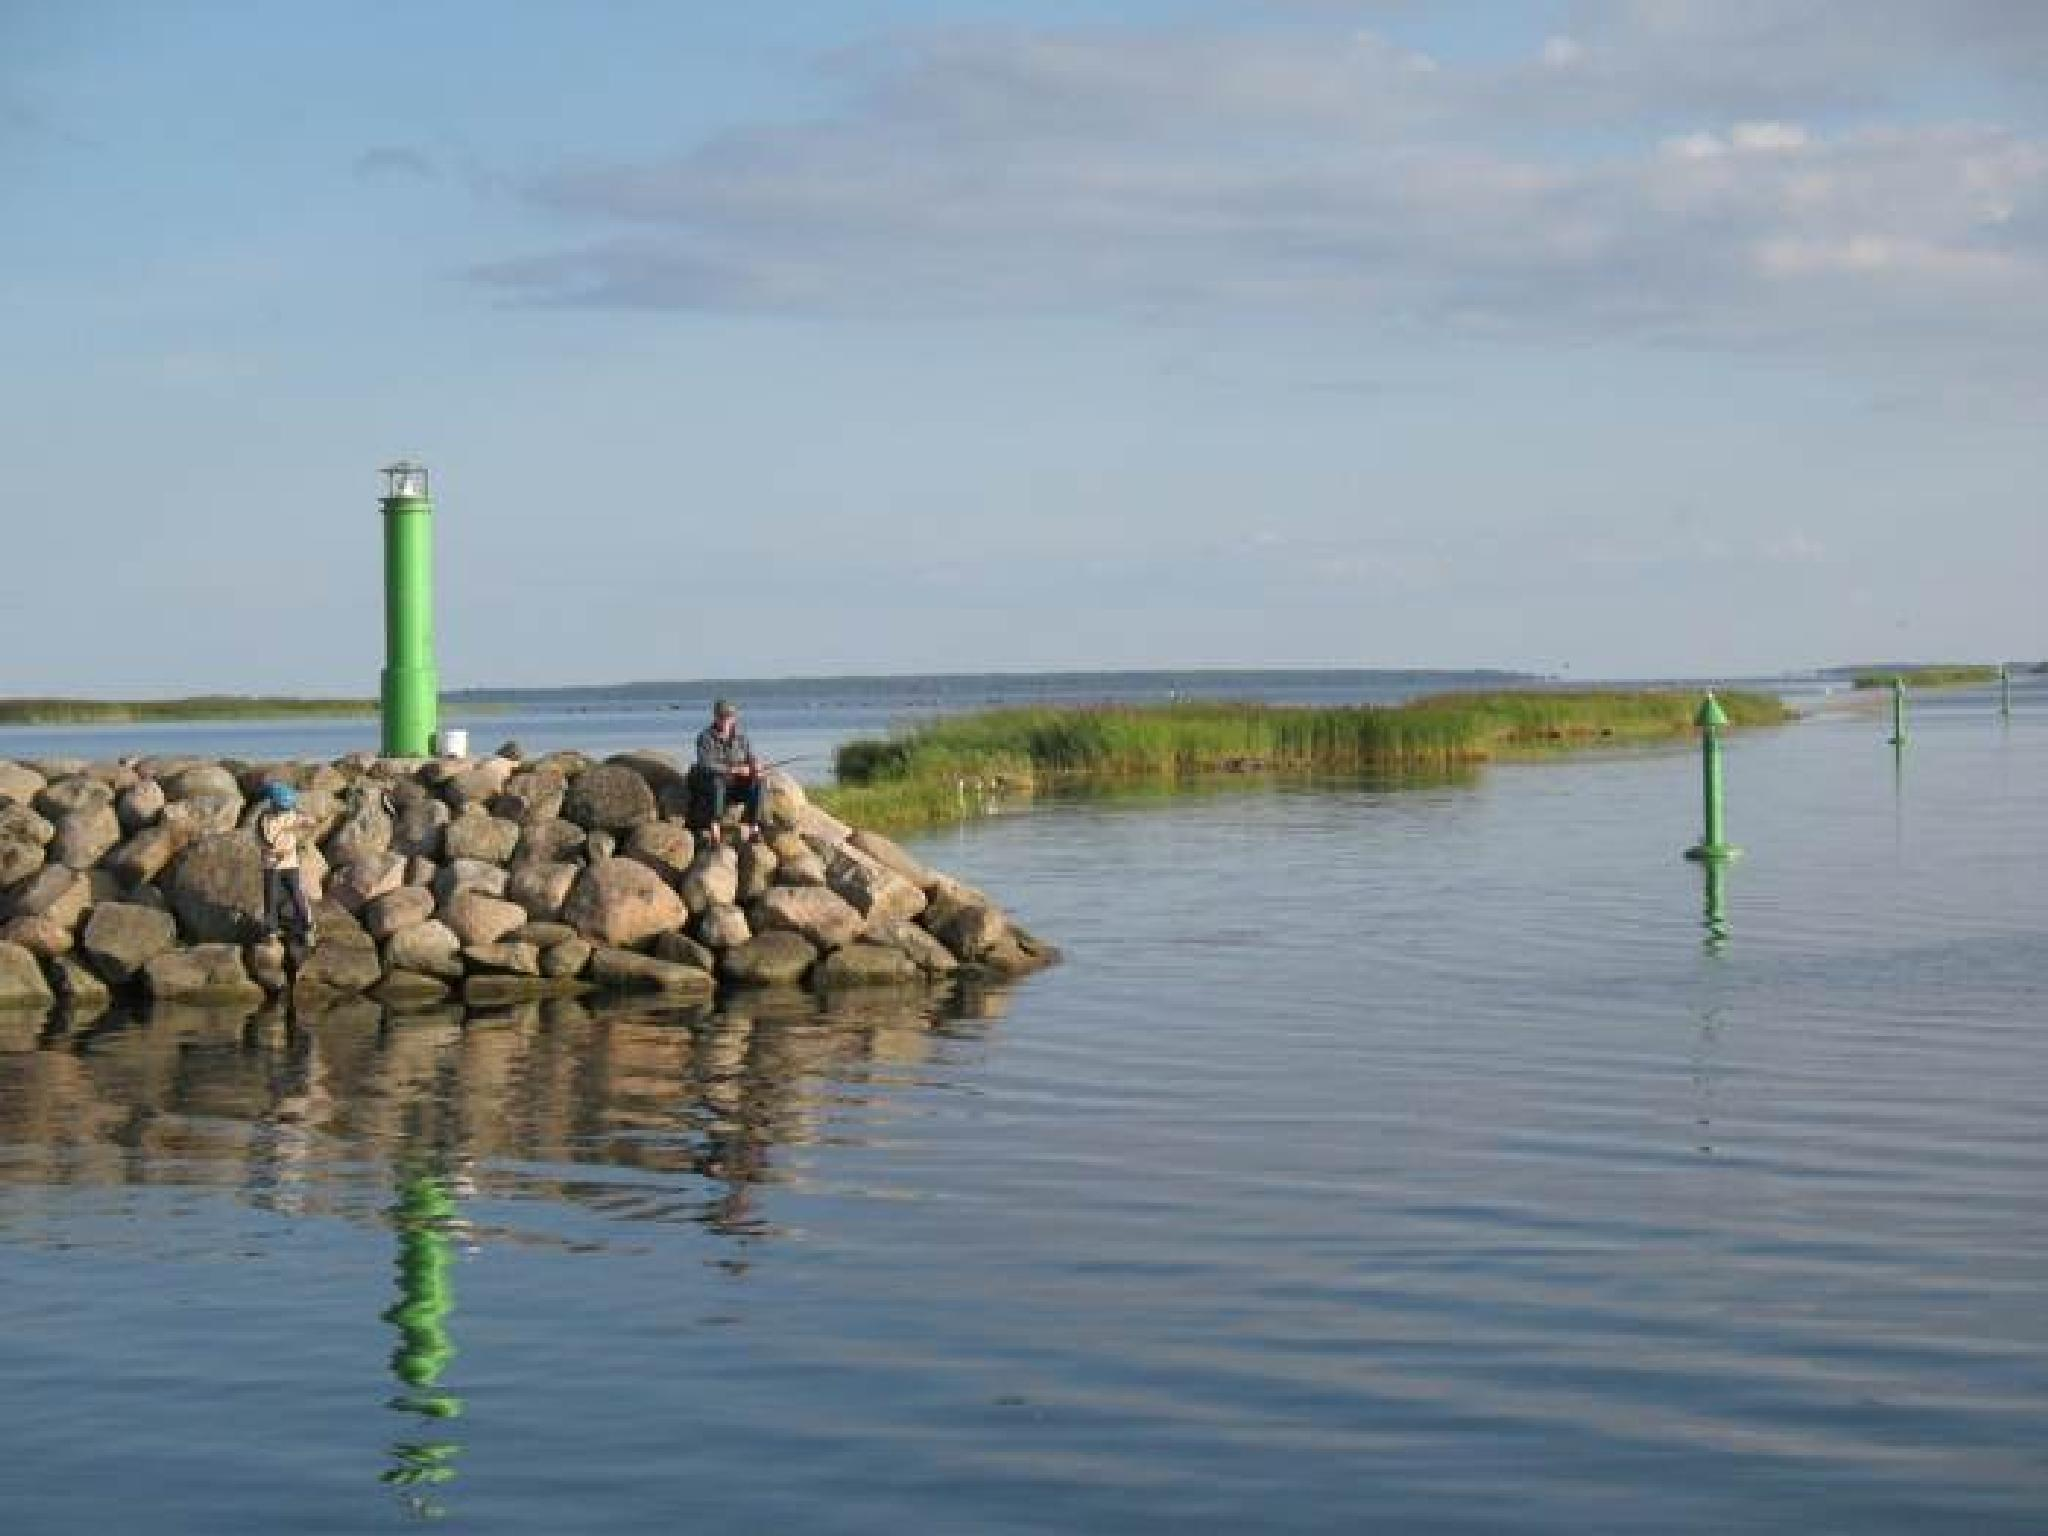 Haapsalu, Estonia by riddelljane